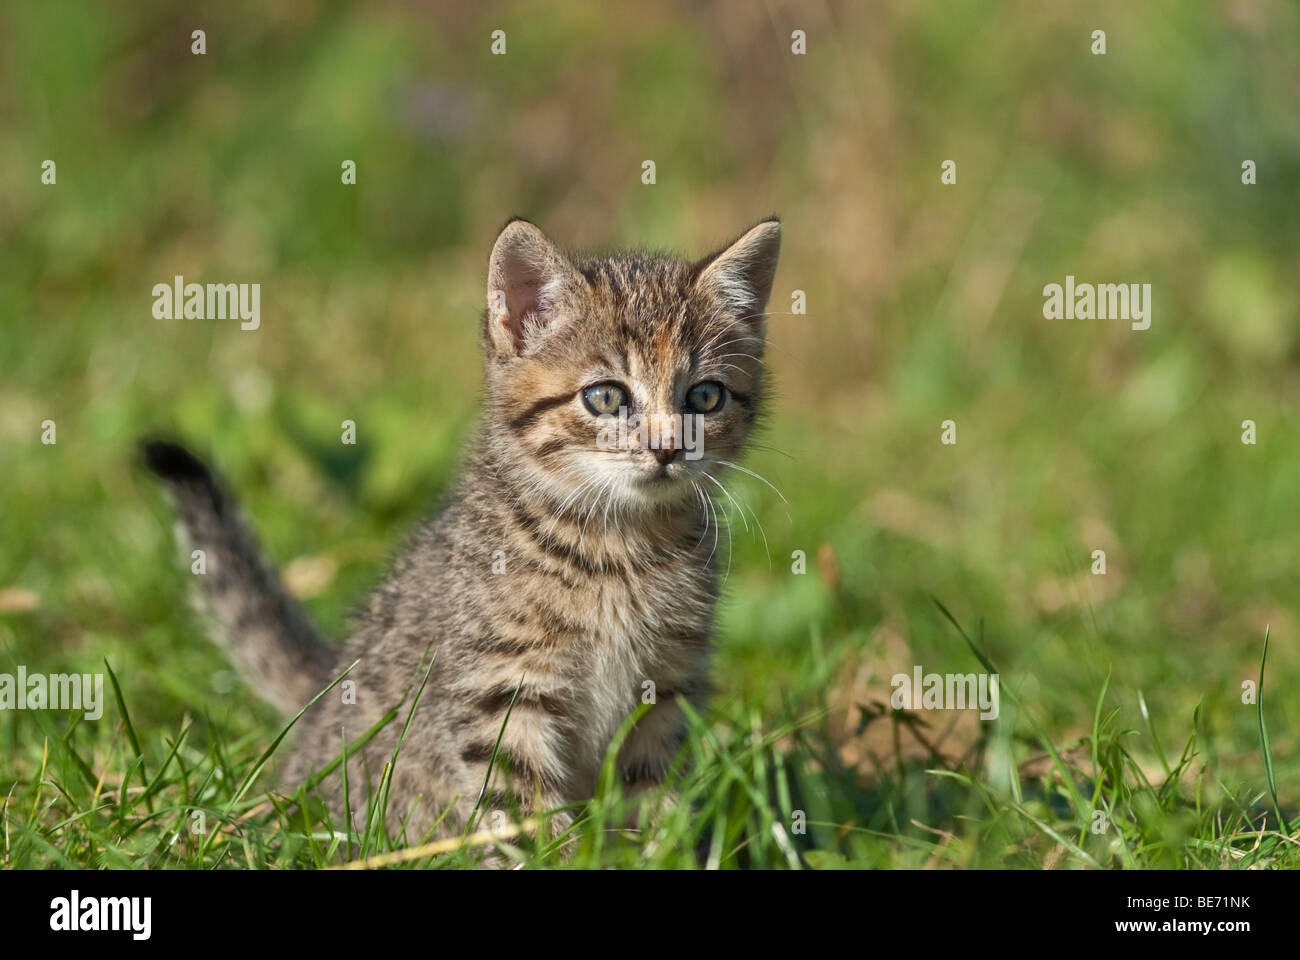 Domestic cat, kitten on a meadow - Stock Image